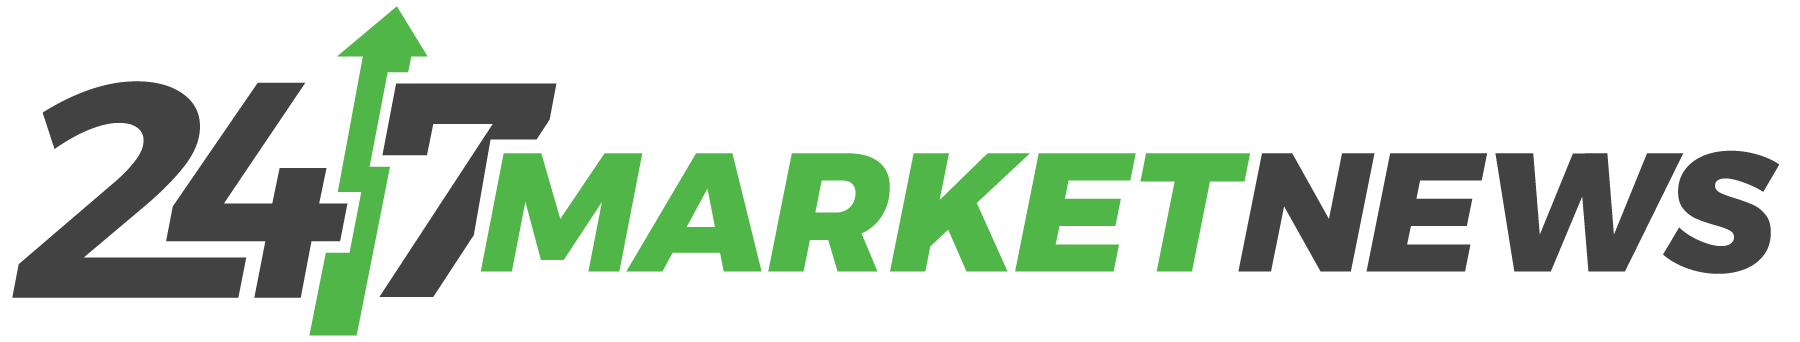 24/7 MarketNews